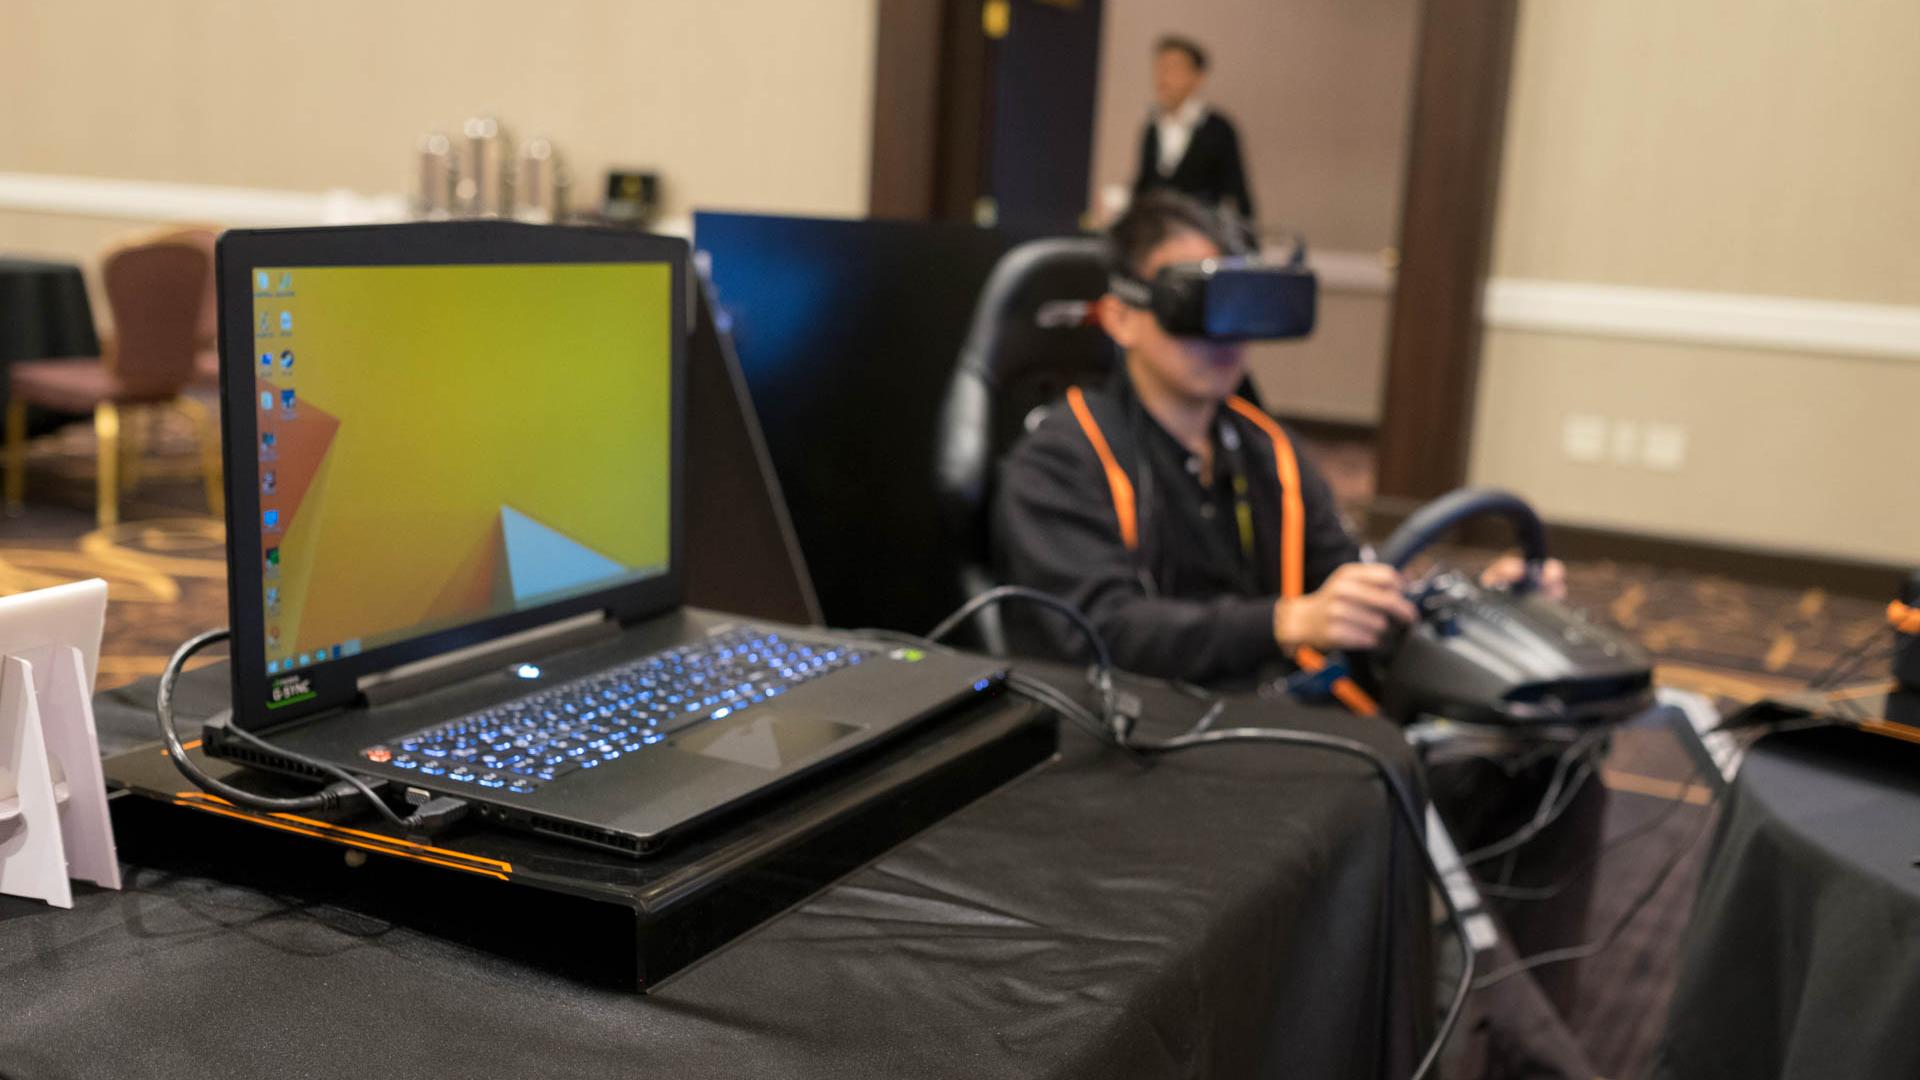 Best Laptop for Oculus Rift Dk2